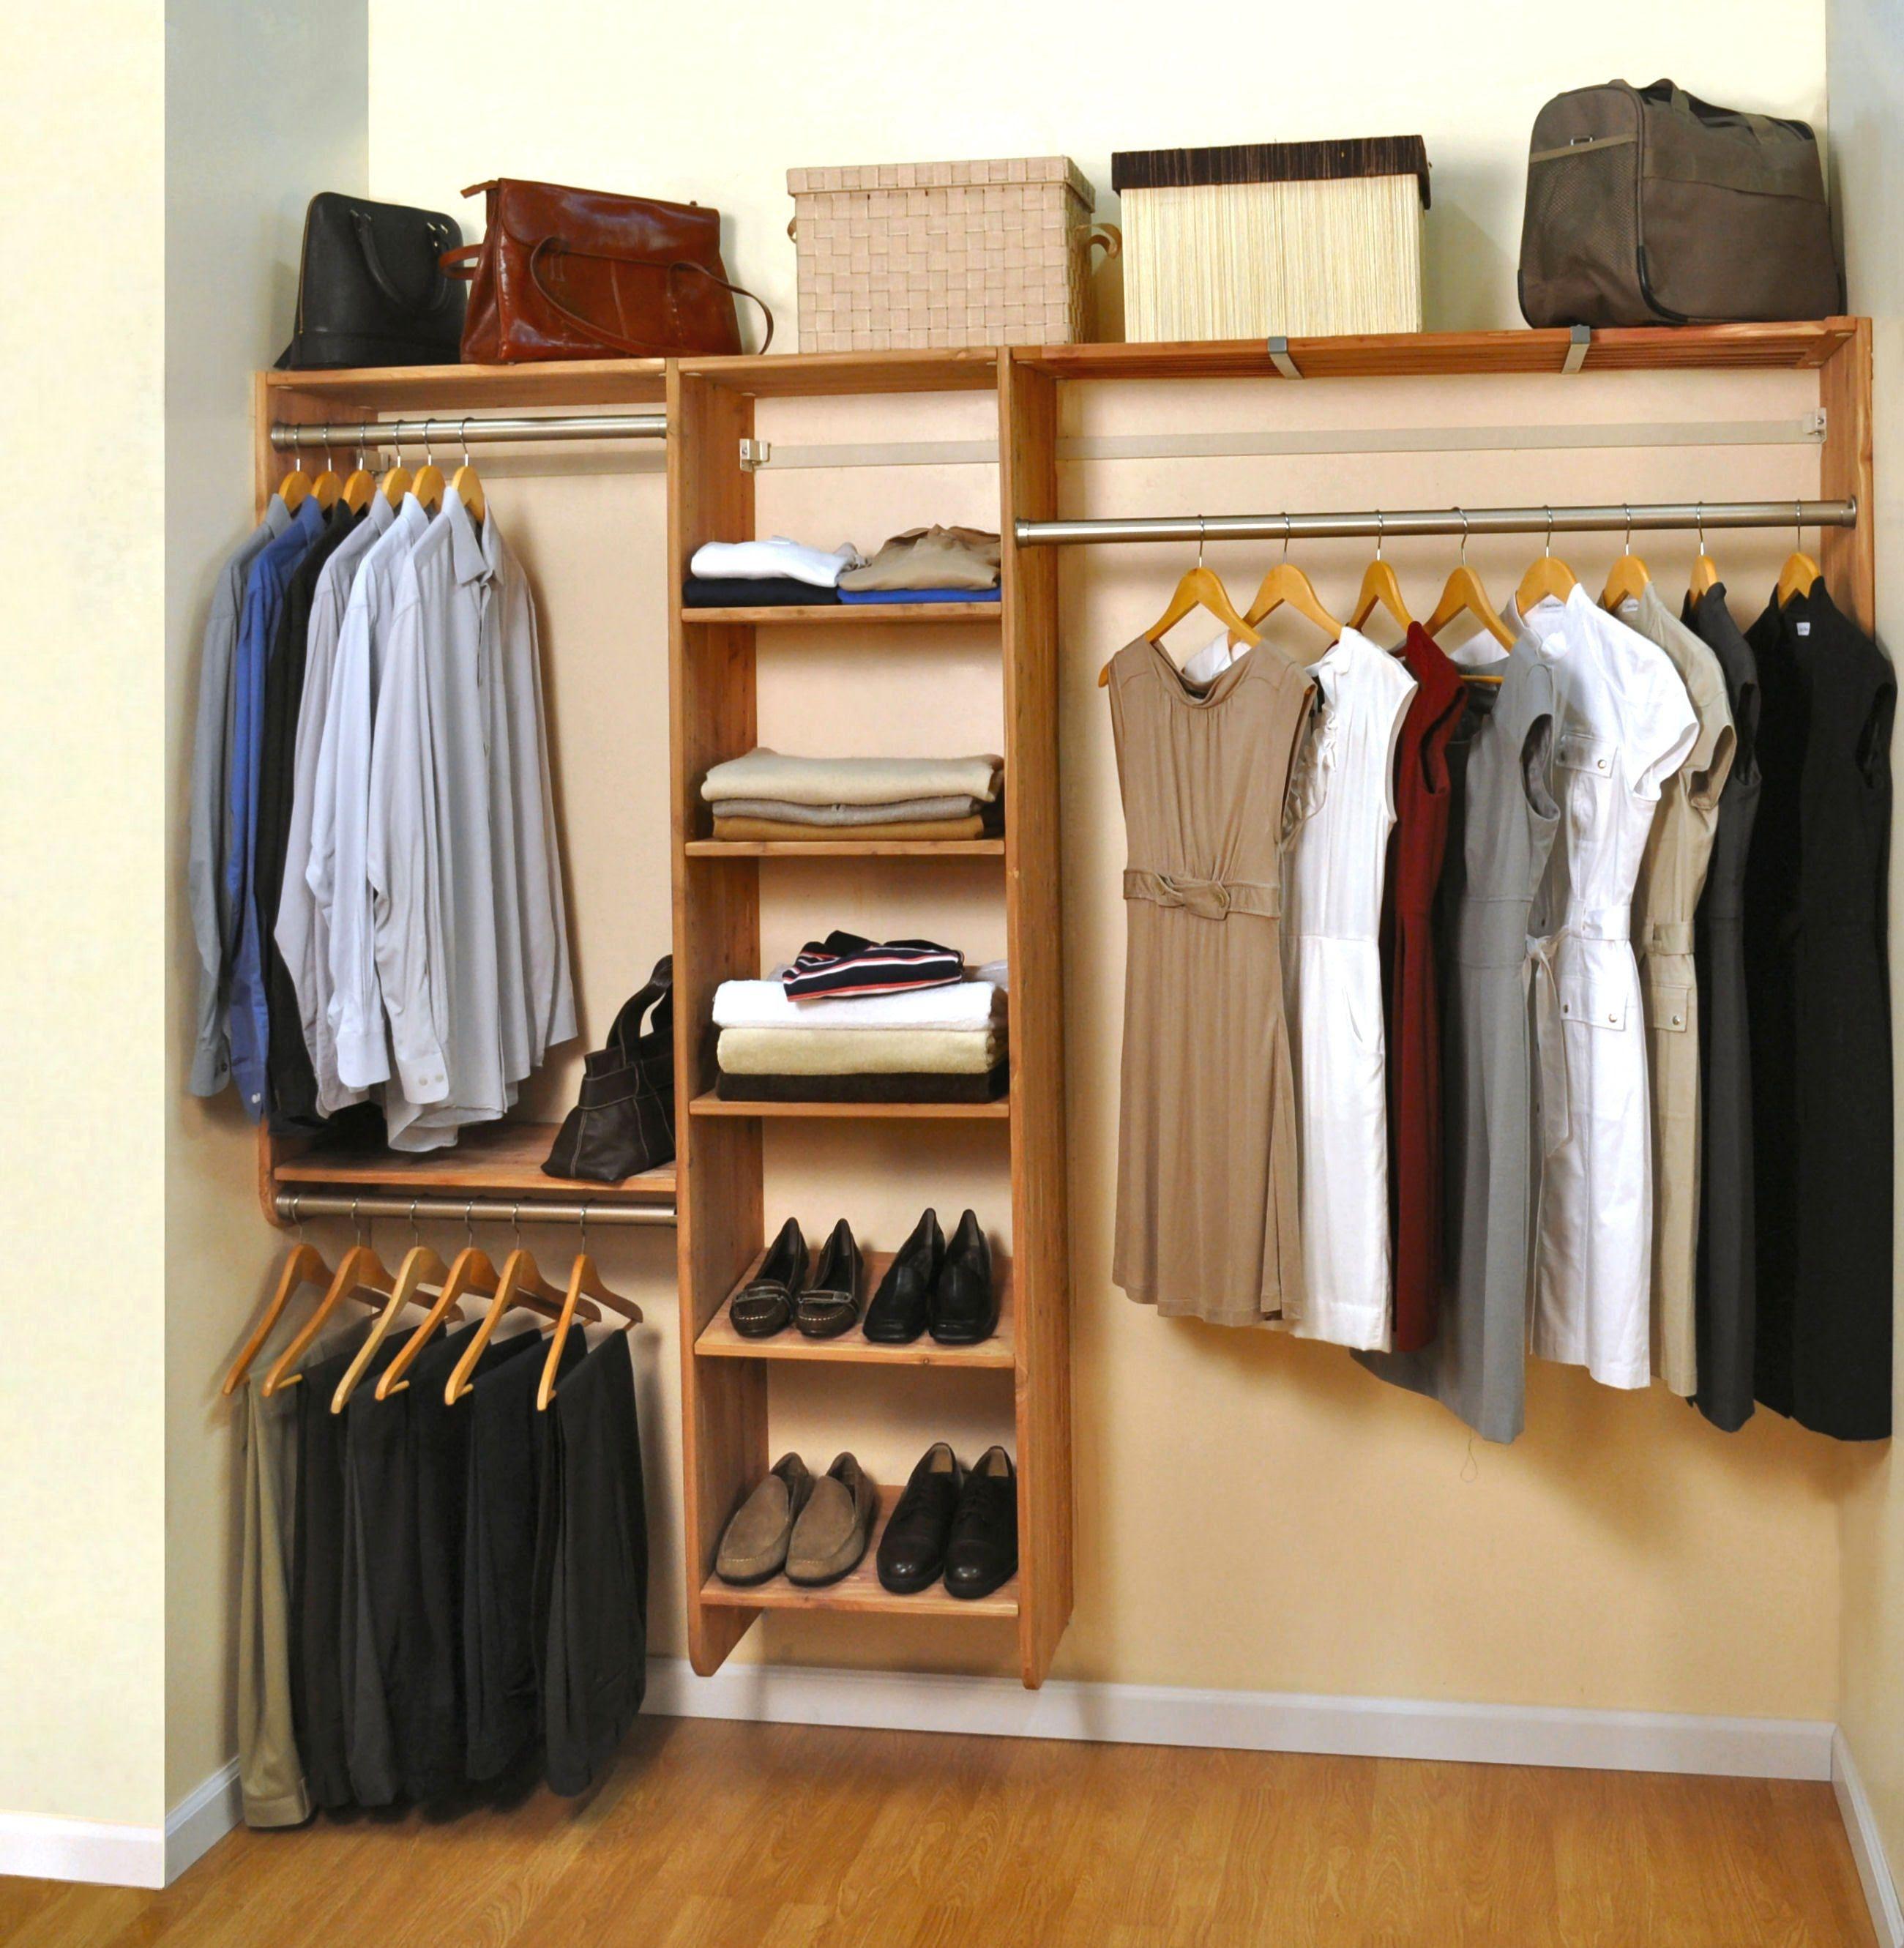 Designing A Closet Storage System Closet Storage Systems Wood Closet Organizers Cedar Closet